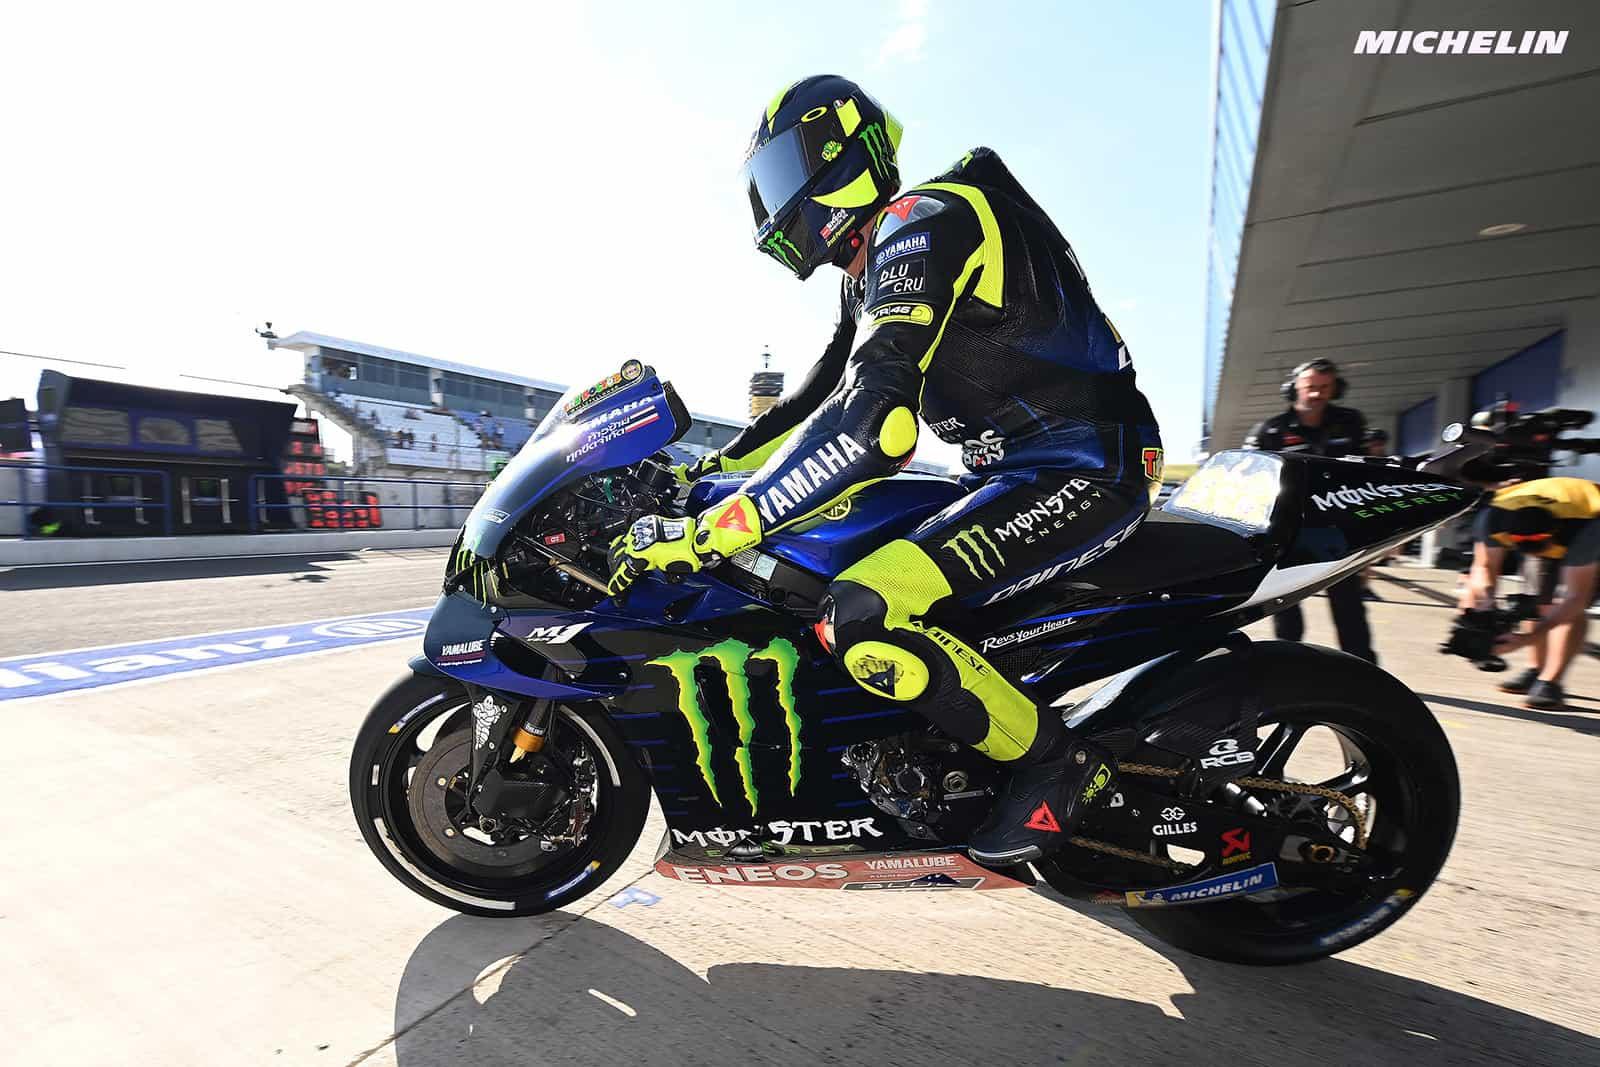 MotoGP2019ヘレスGP FP2 14位ロッシ「バイクのフィーリングが良くない」